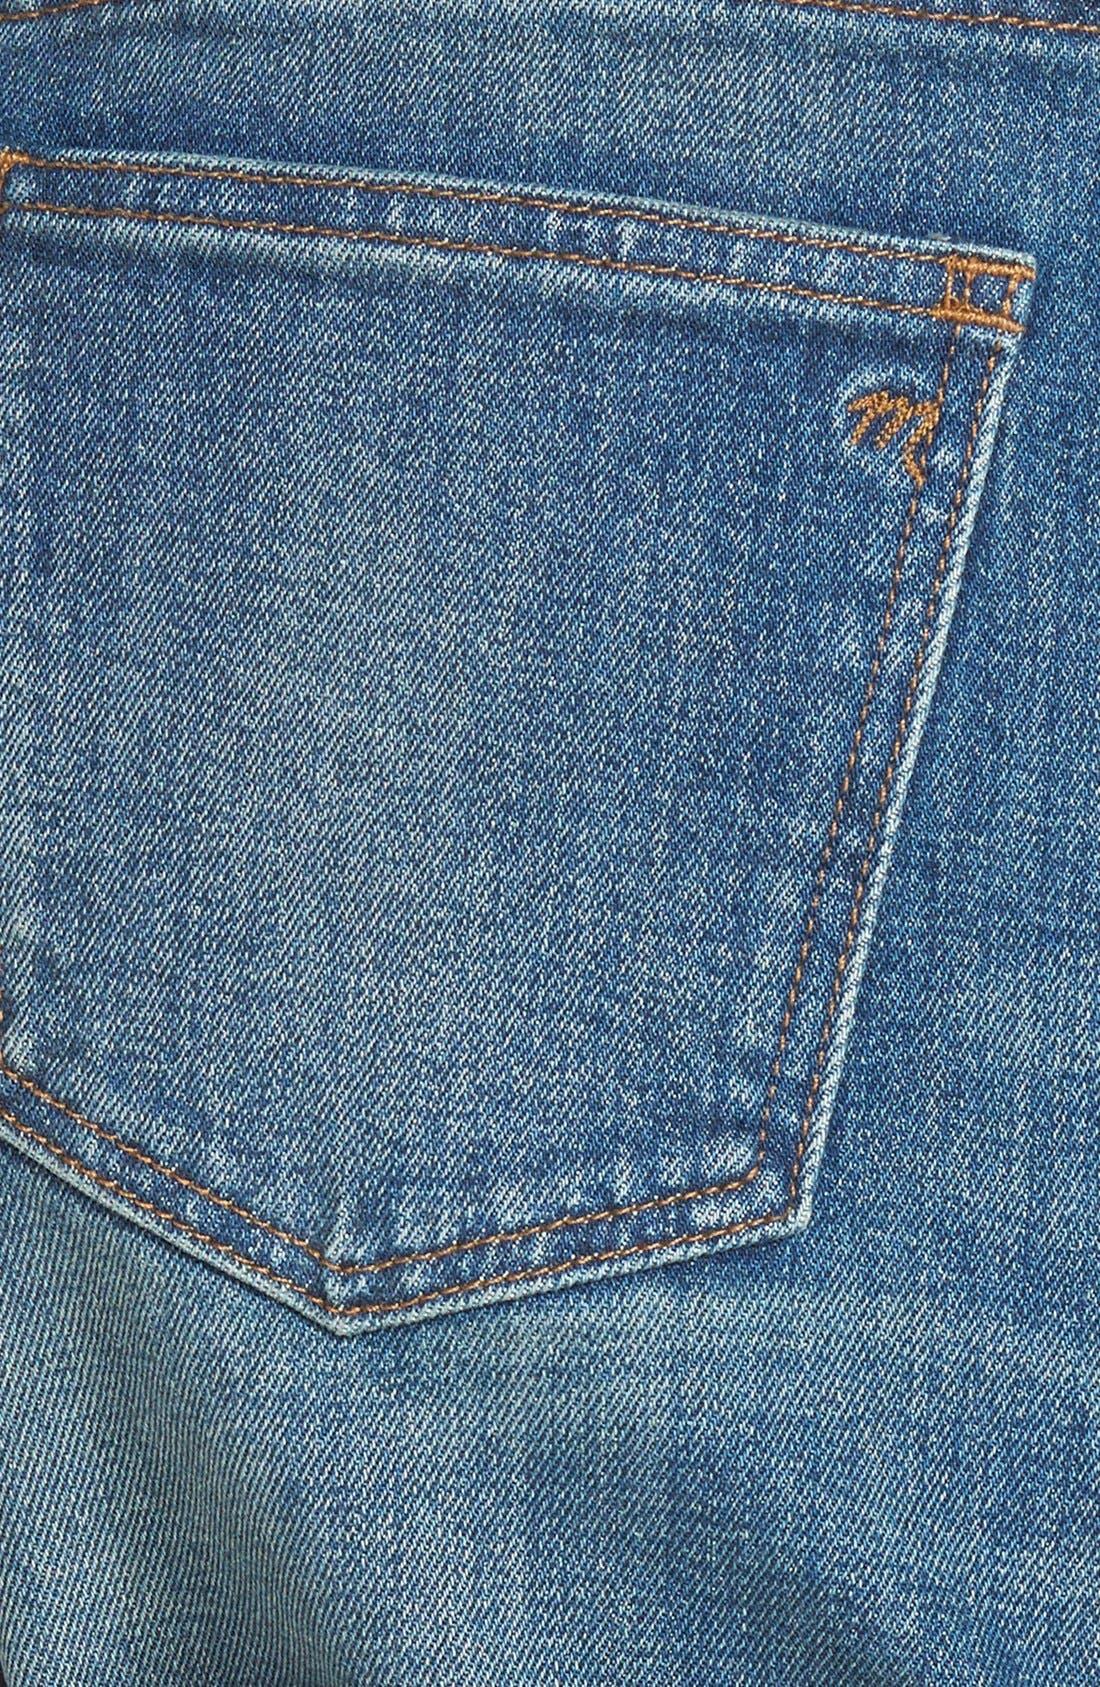 Alternate Image 3  - Madewell High Rise Denim Shorts (Denver)